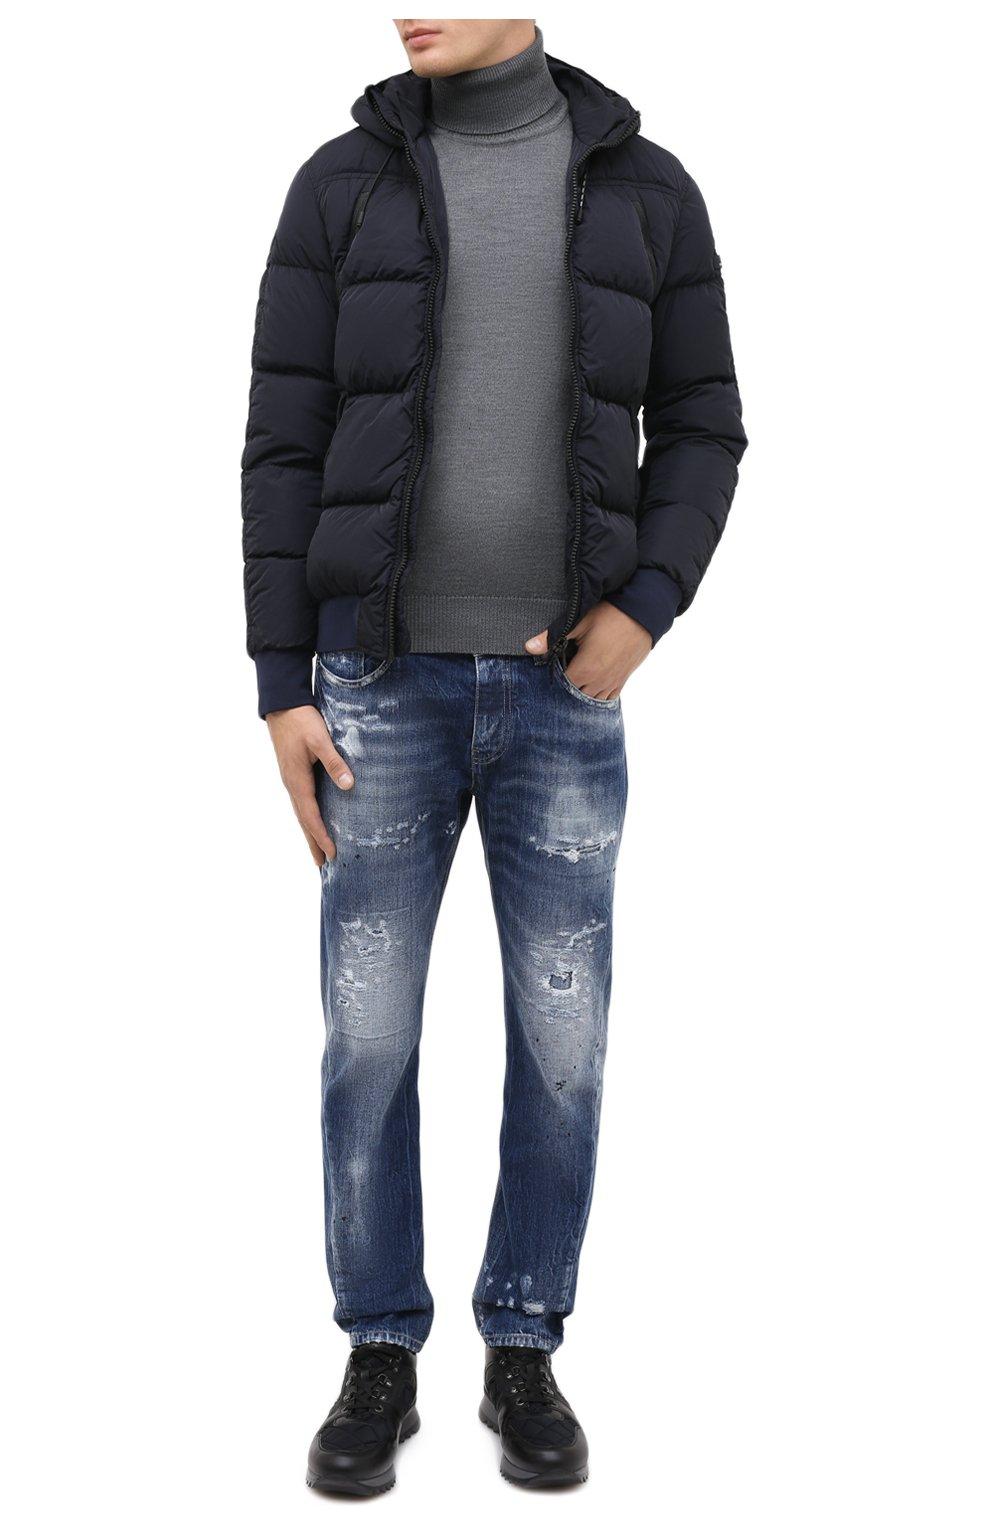 Мужские джинсы PREMIUM MOOD DENIM SUPERIOR синего цвета, арт. F21 352740221/BARRET   Фото 2